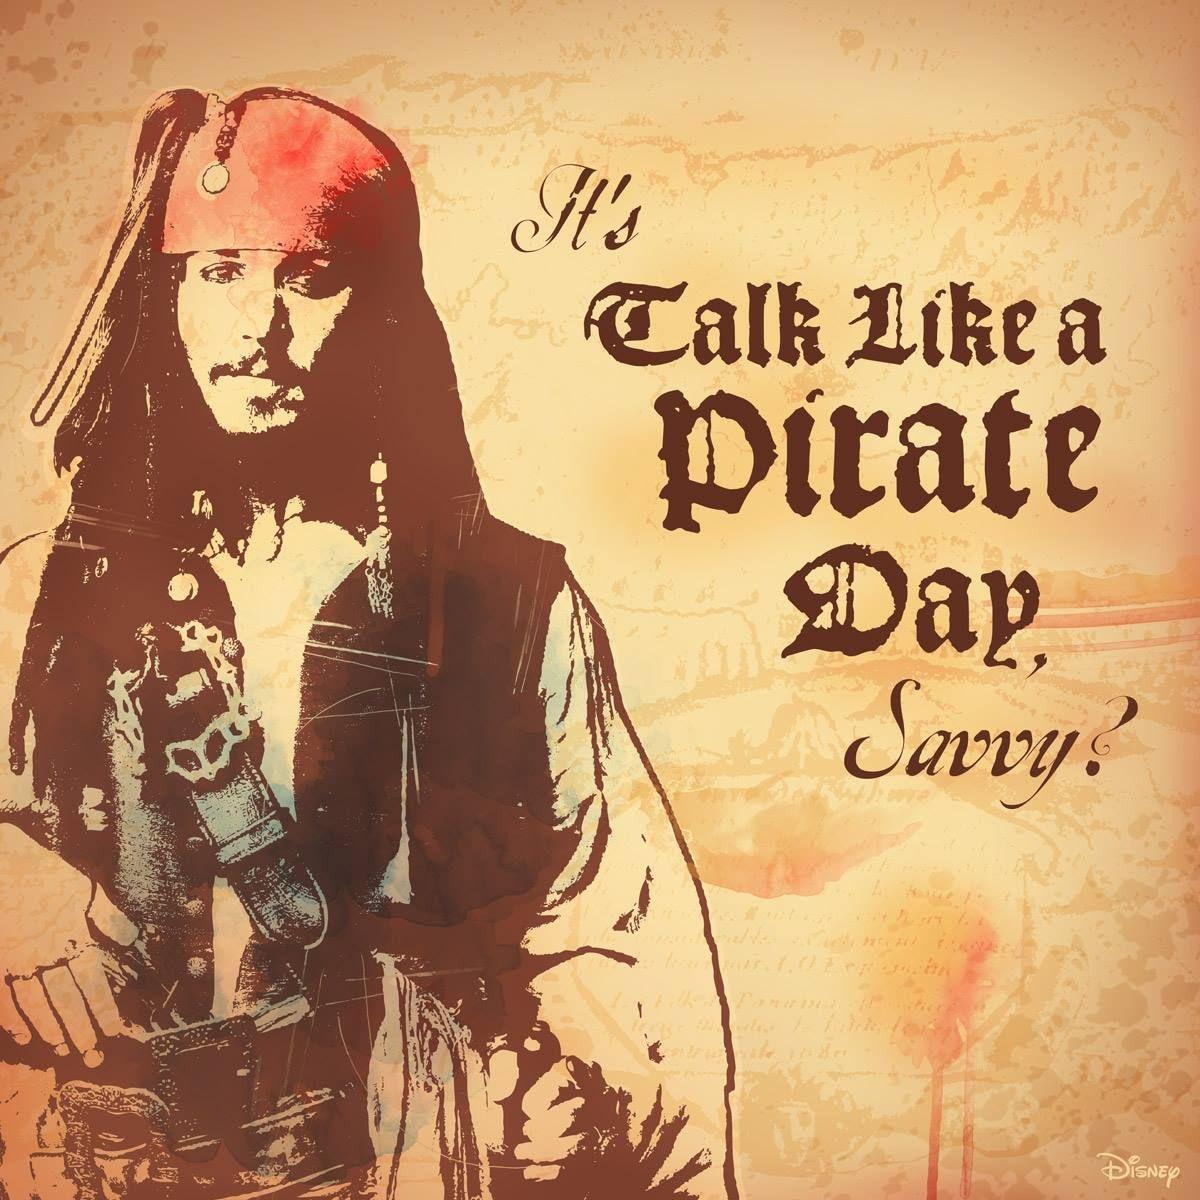 It's Talk Like a Pirate Day, savvy? So saith Captain Jack Sparrow.